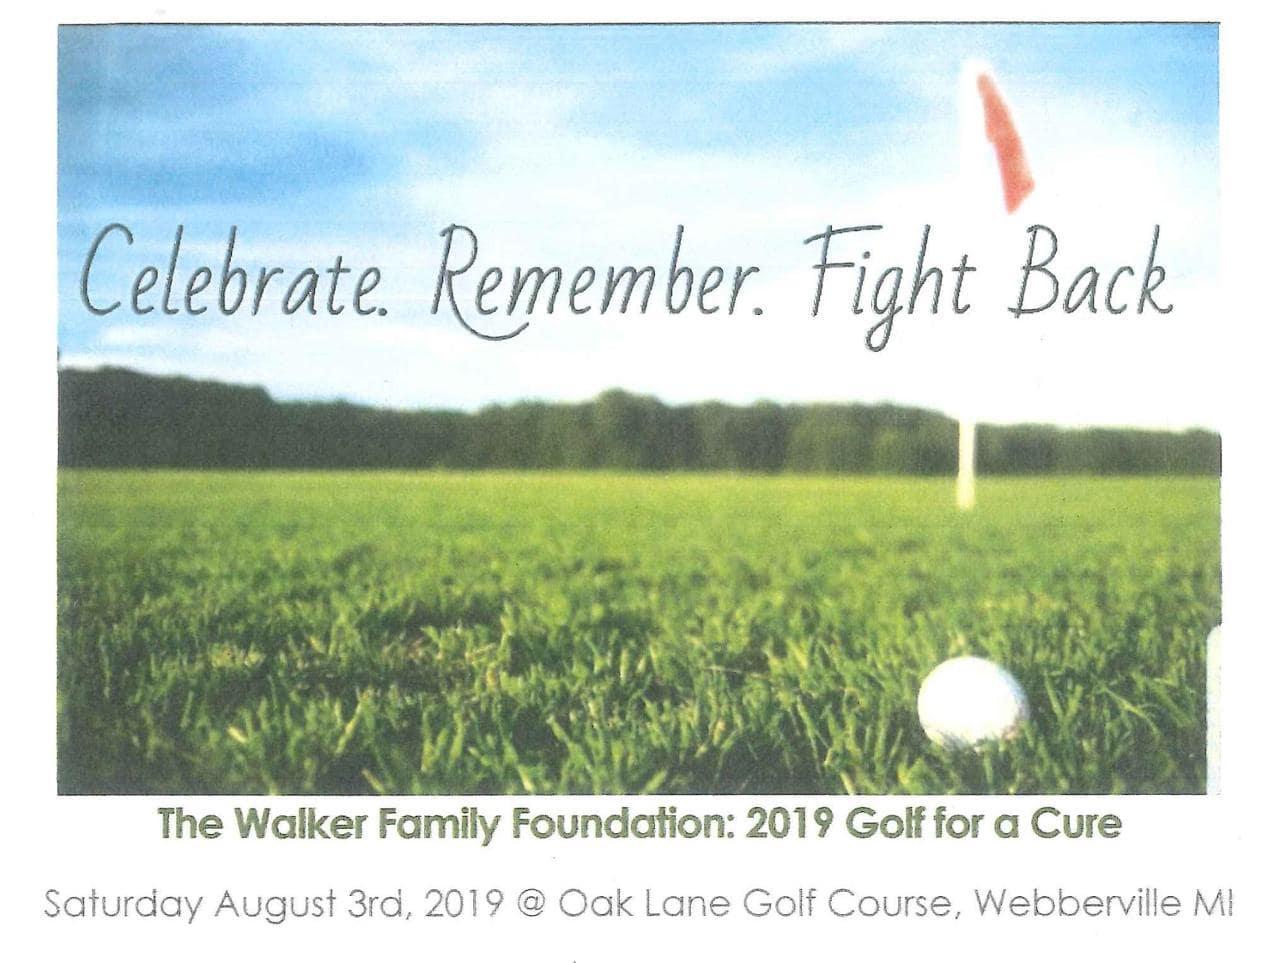 Celebrate-remember-fight-back-1280x963